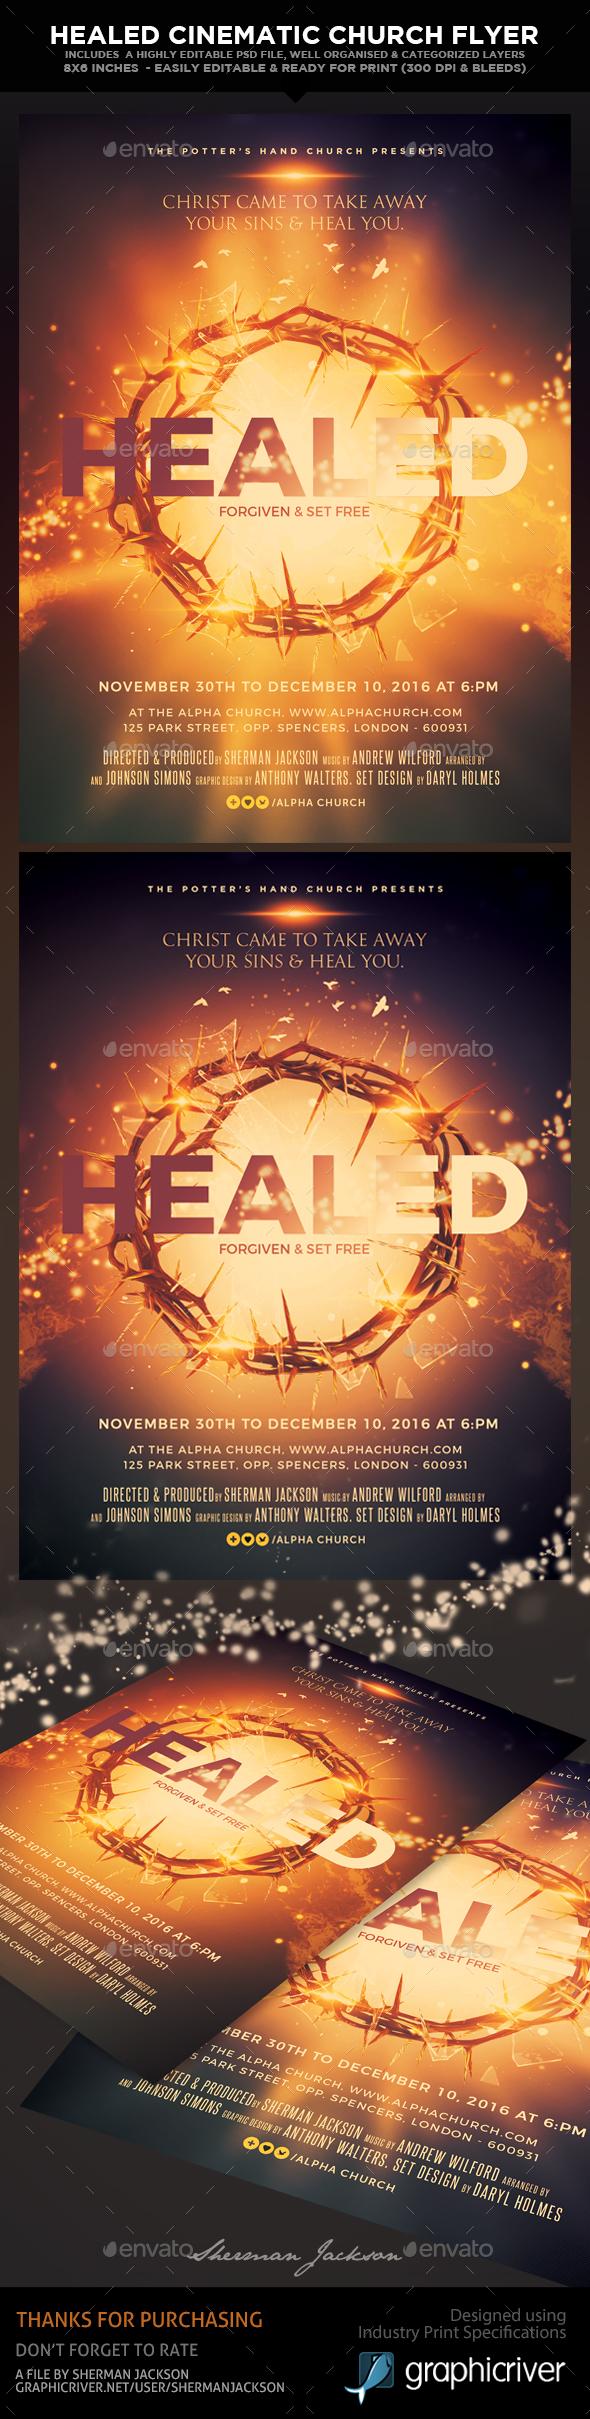 Healed Church Theme Cinematic Flyer - Church Flyers